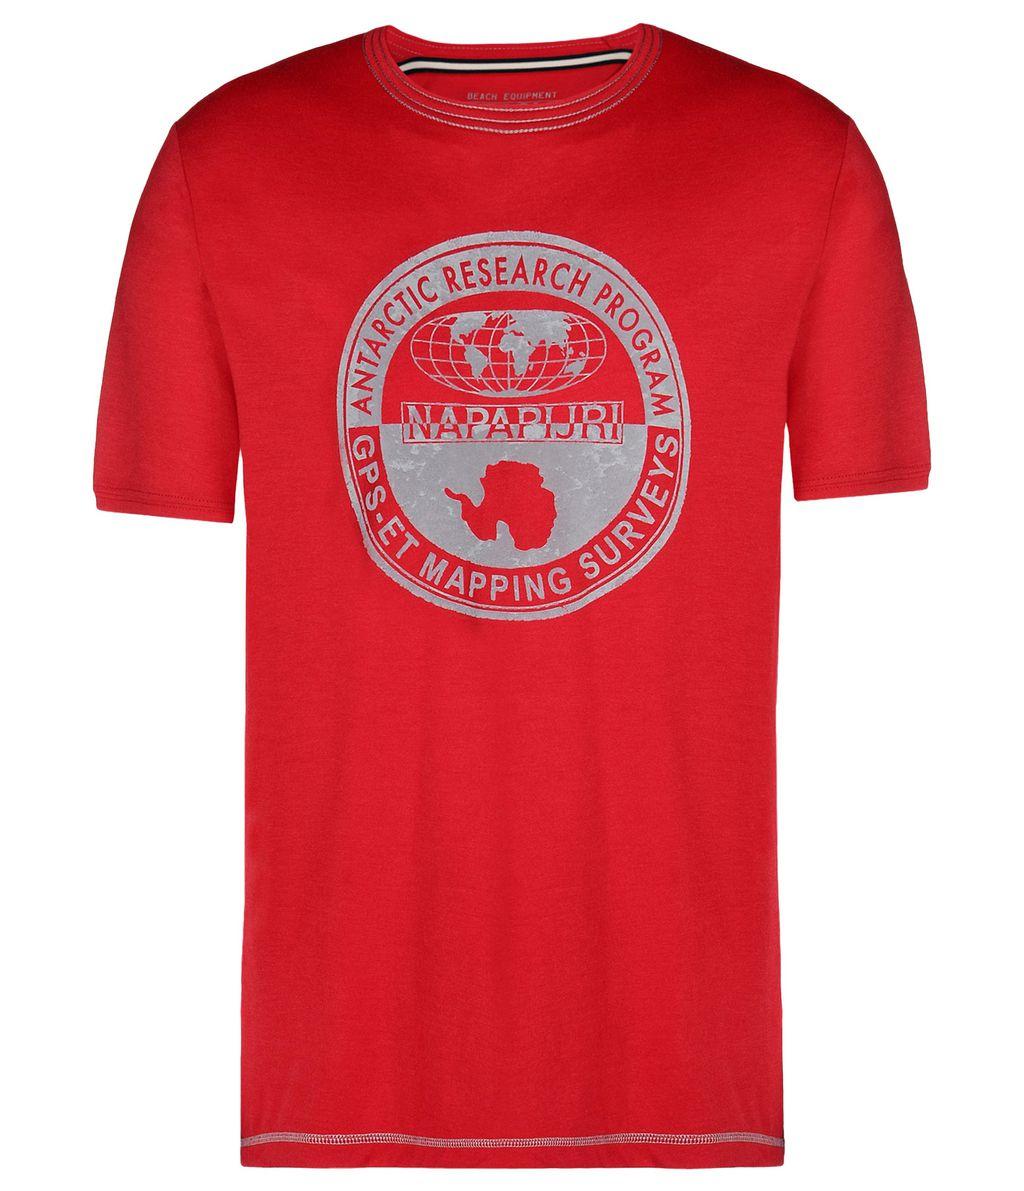 t shirt t shirt norway online shopping